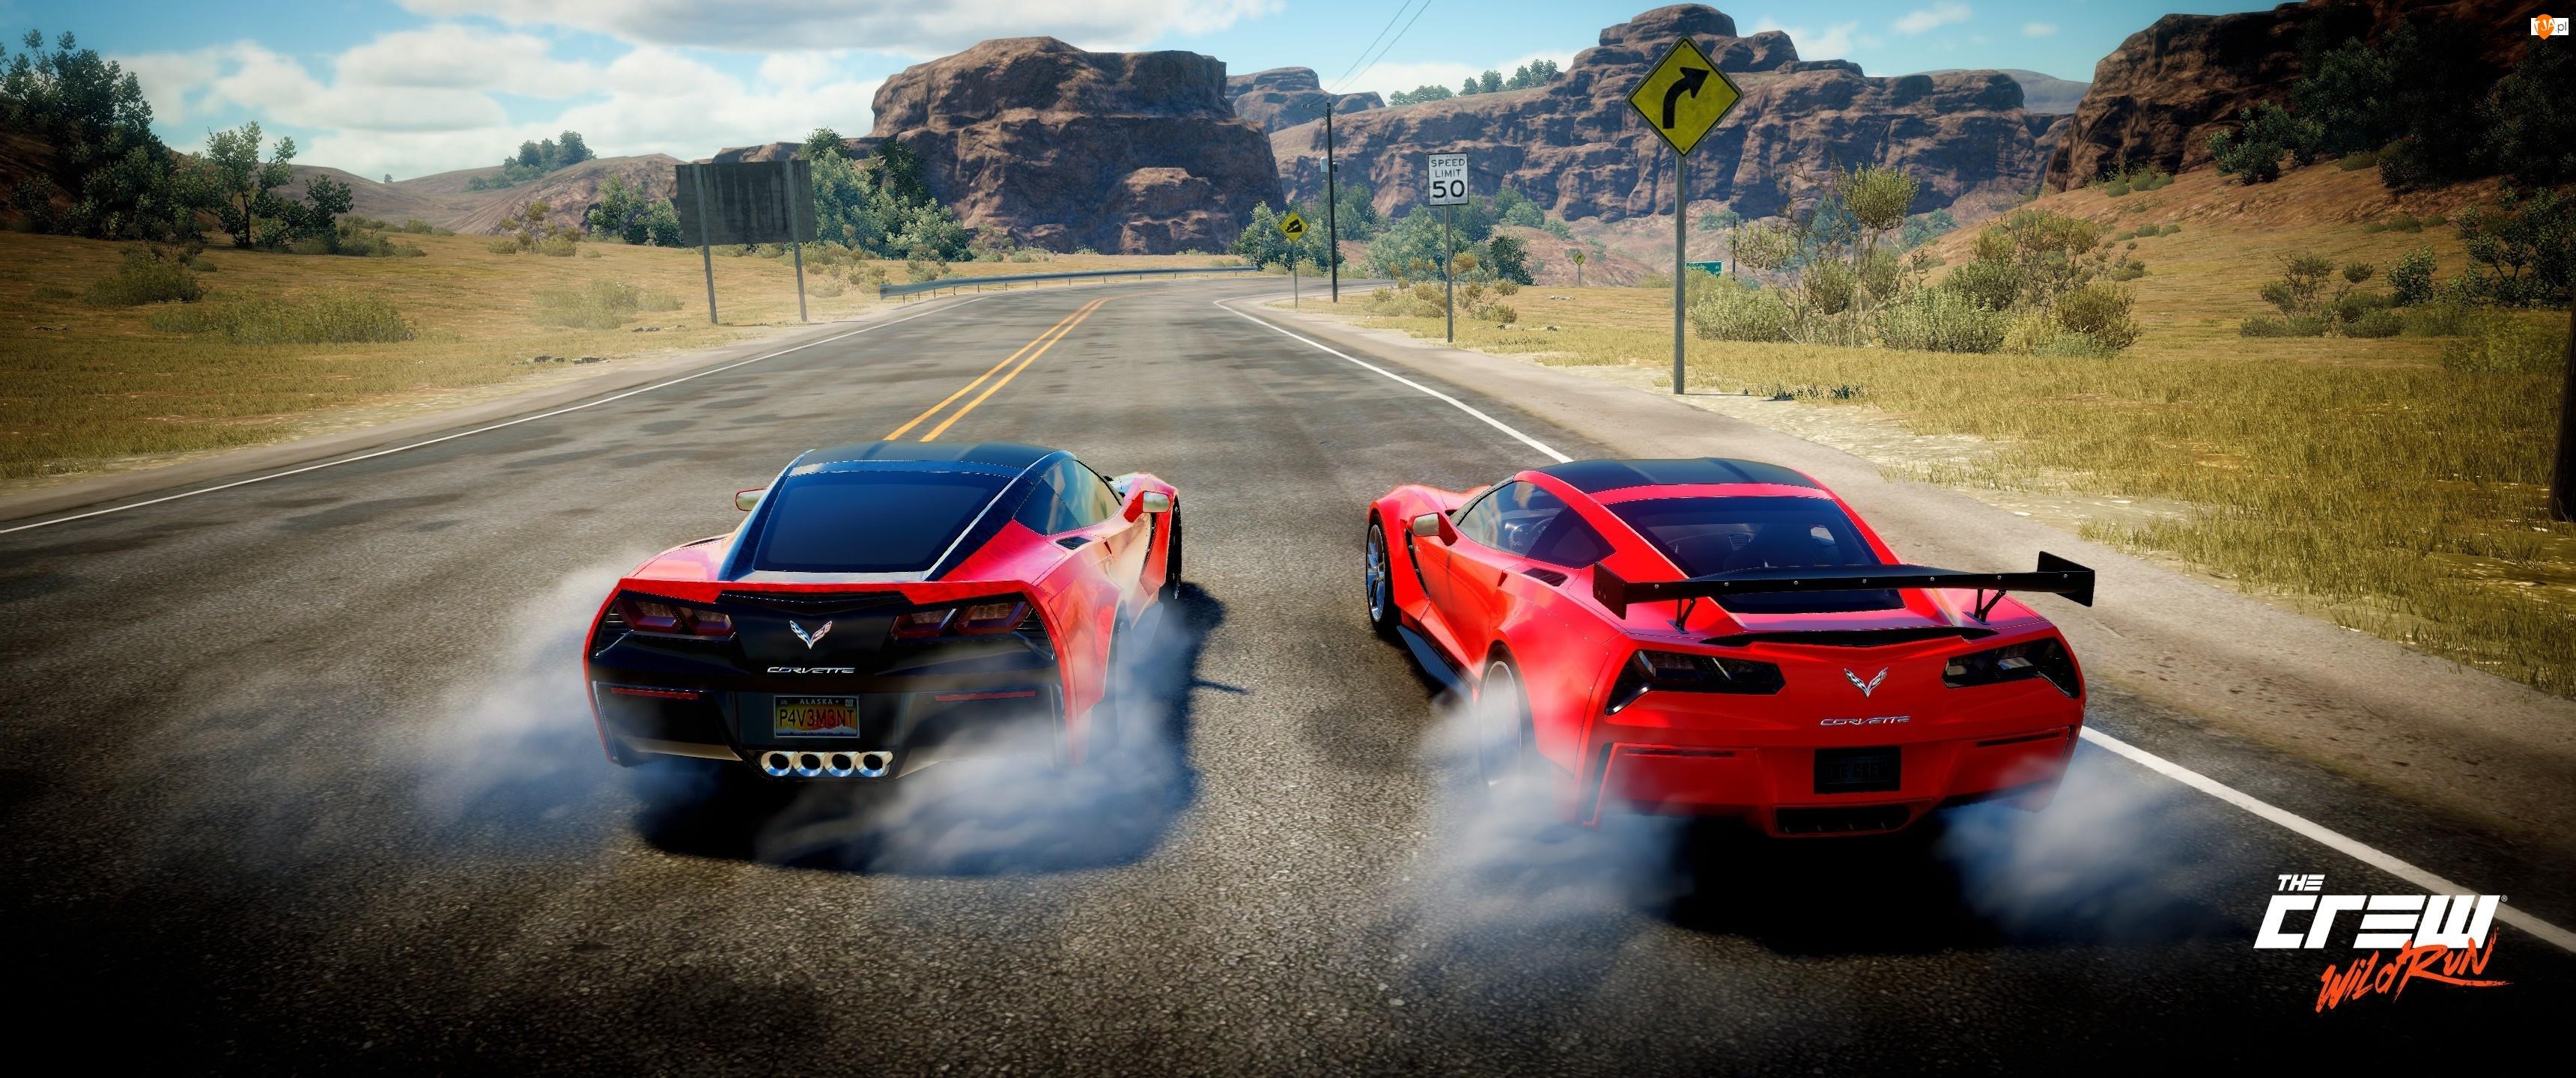 Samochody, Gra, The Crew Wild Run, Droga